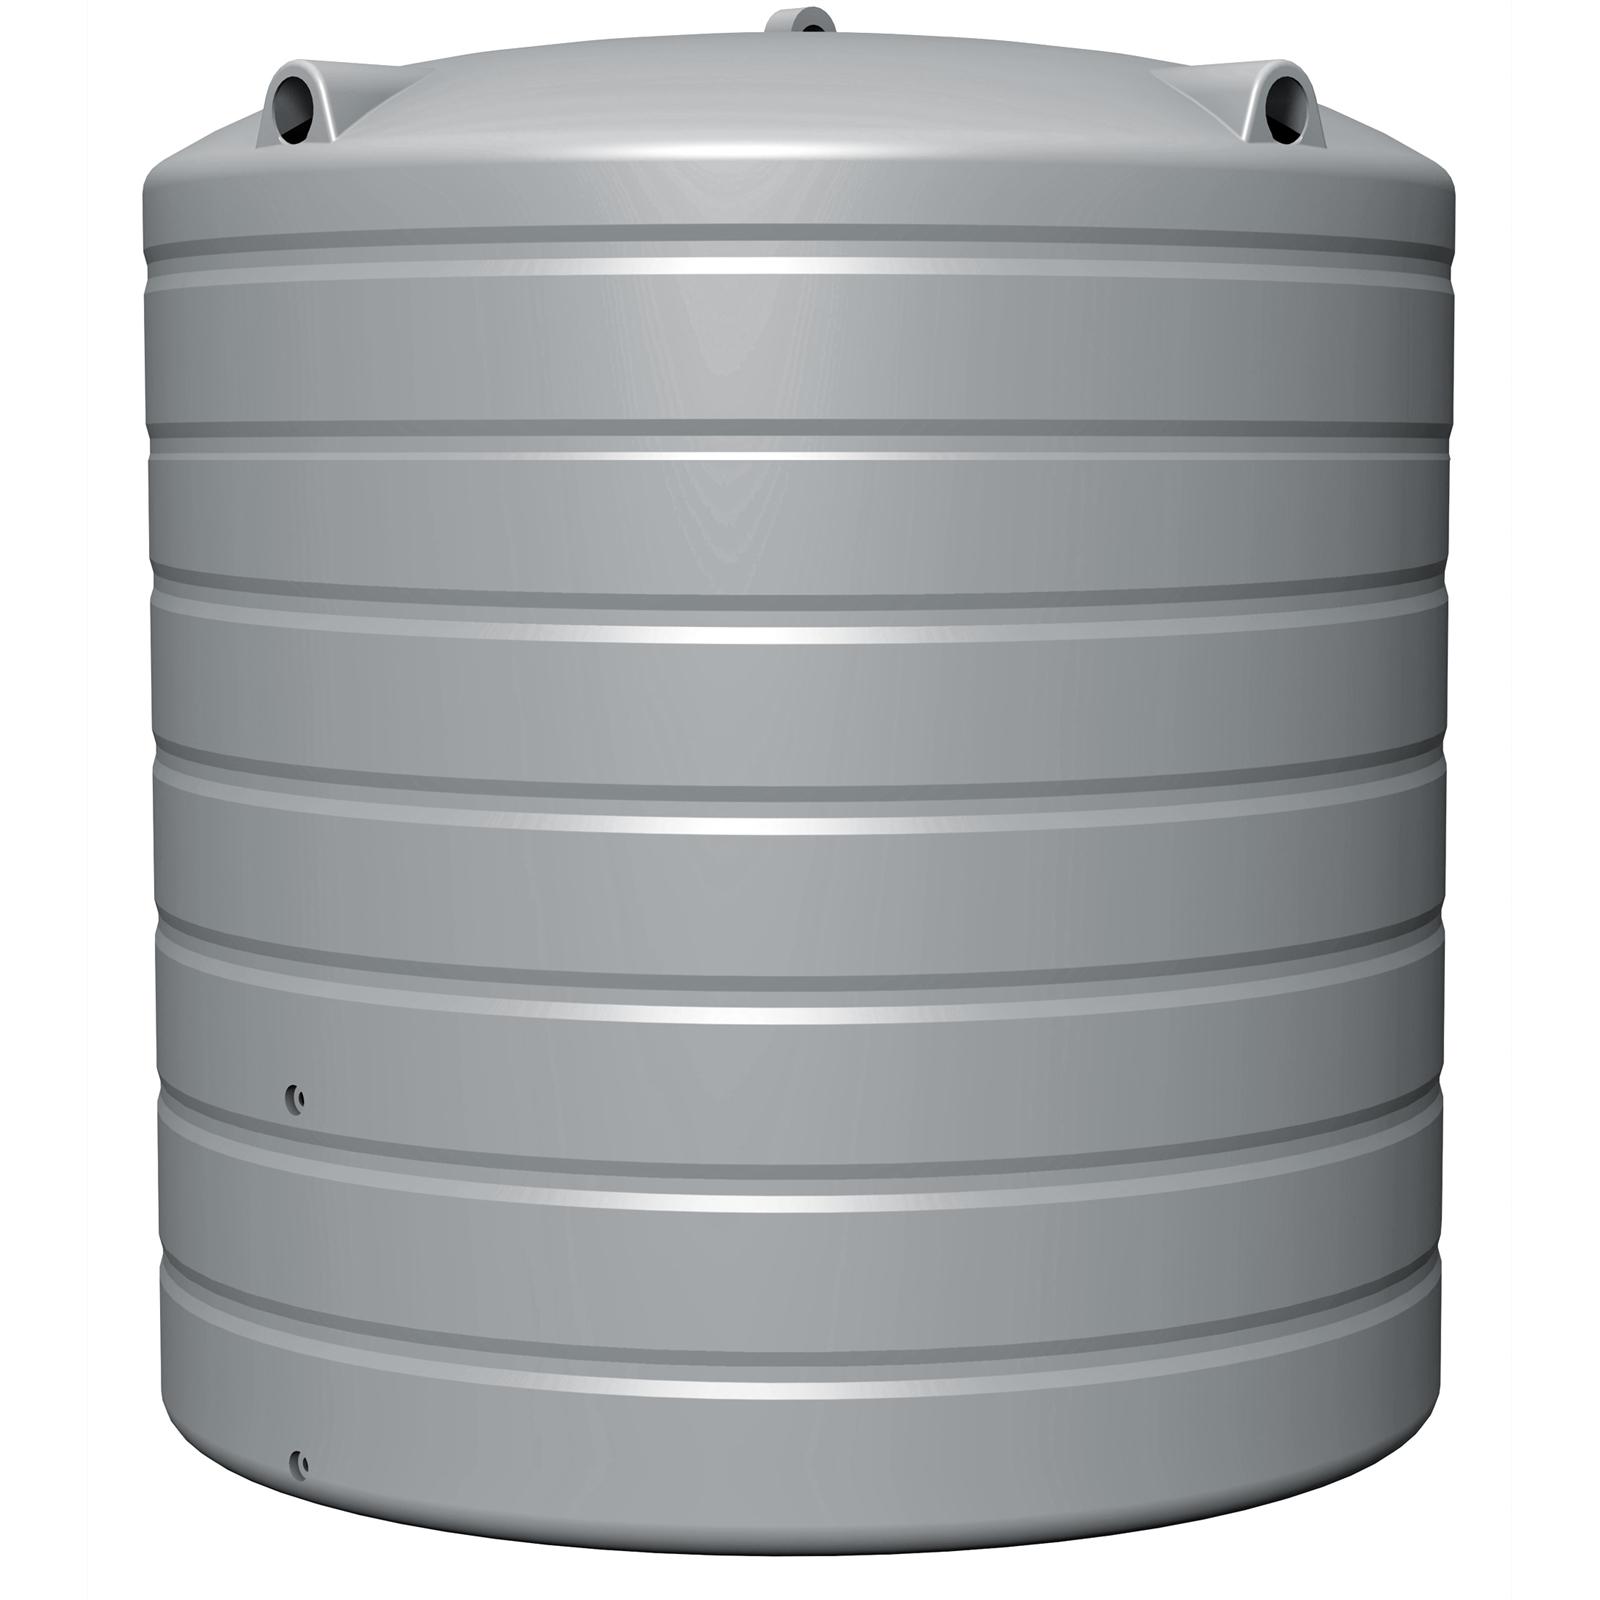 NextGenRoto 4200L Polyethylene Round Water Tank - Armour Grey